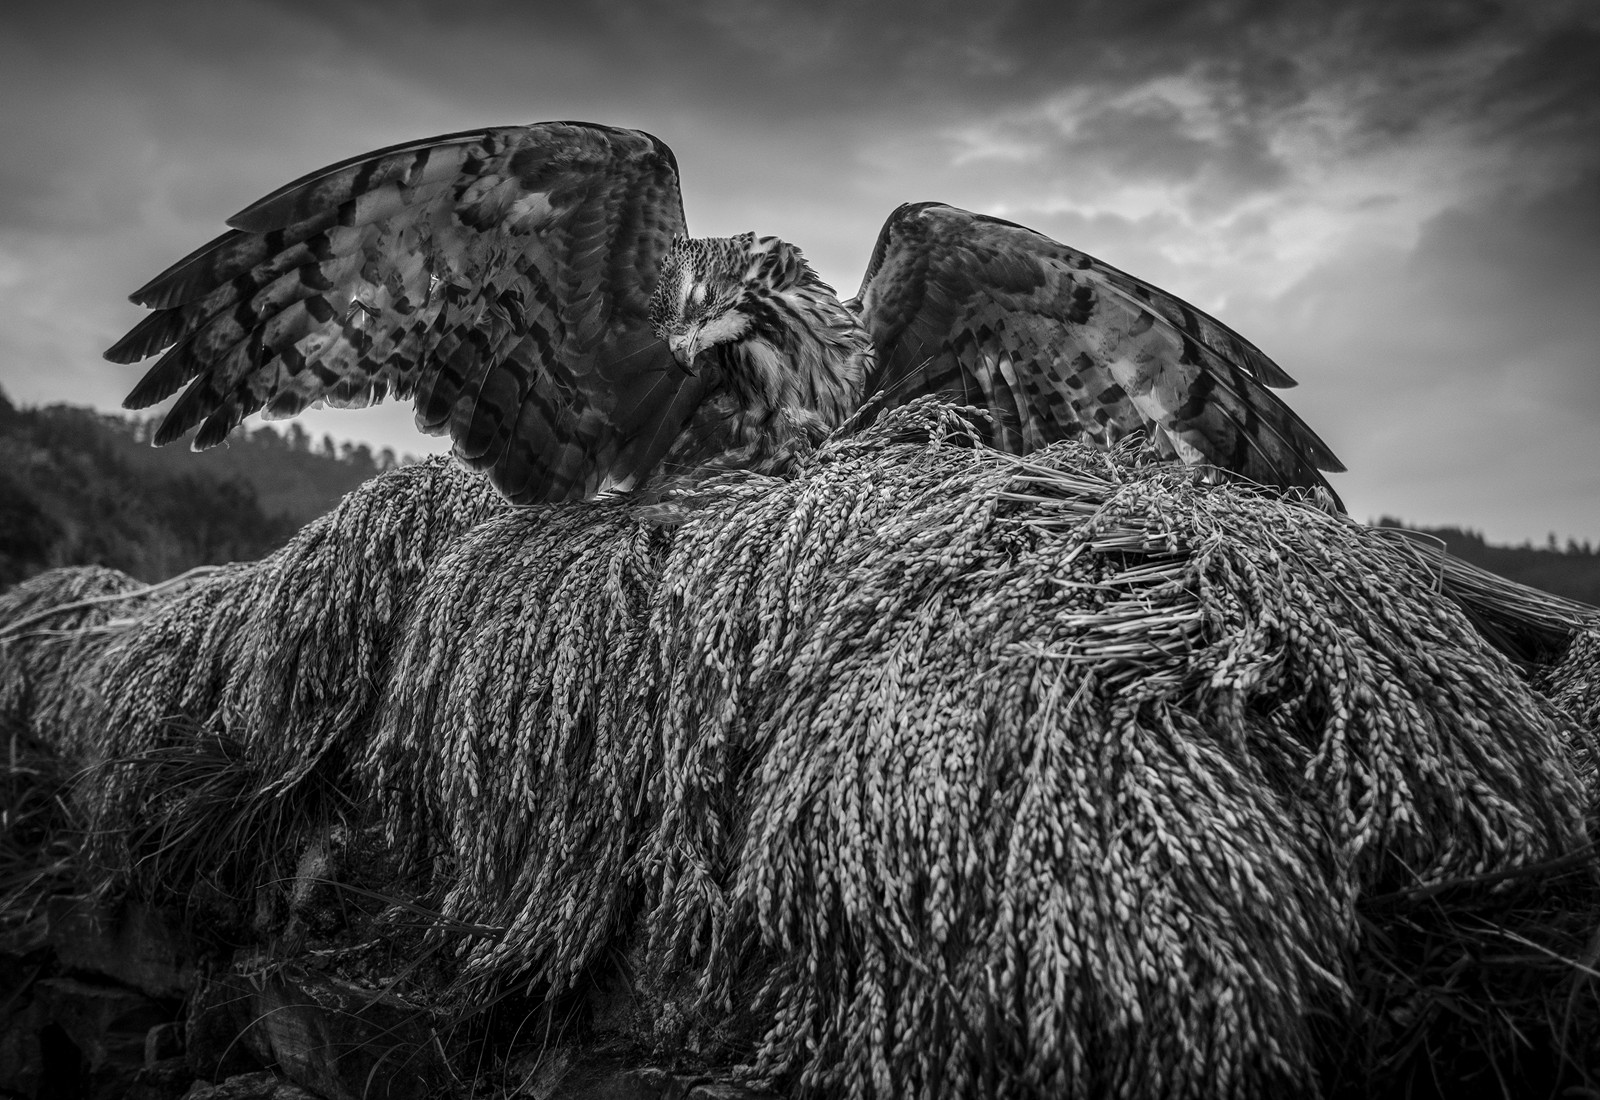 kuang-huimin-ancient-kam-rice-of-millennium-photography-of-china-(31).jpg